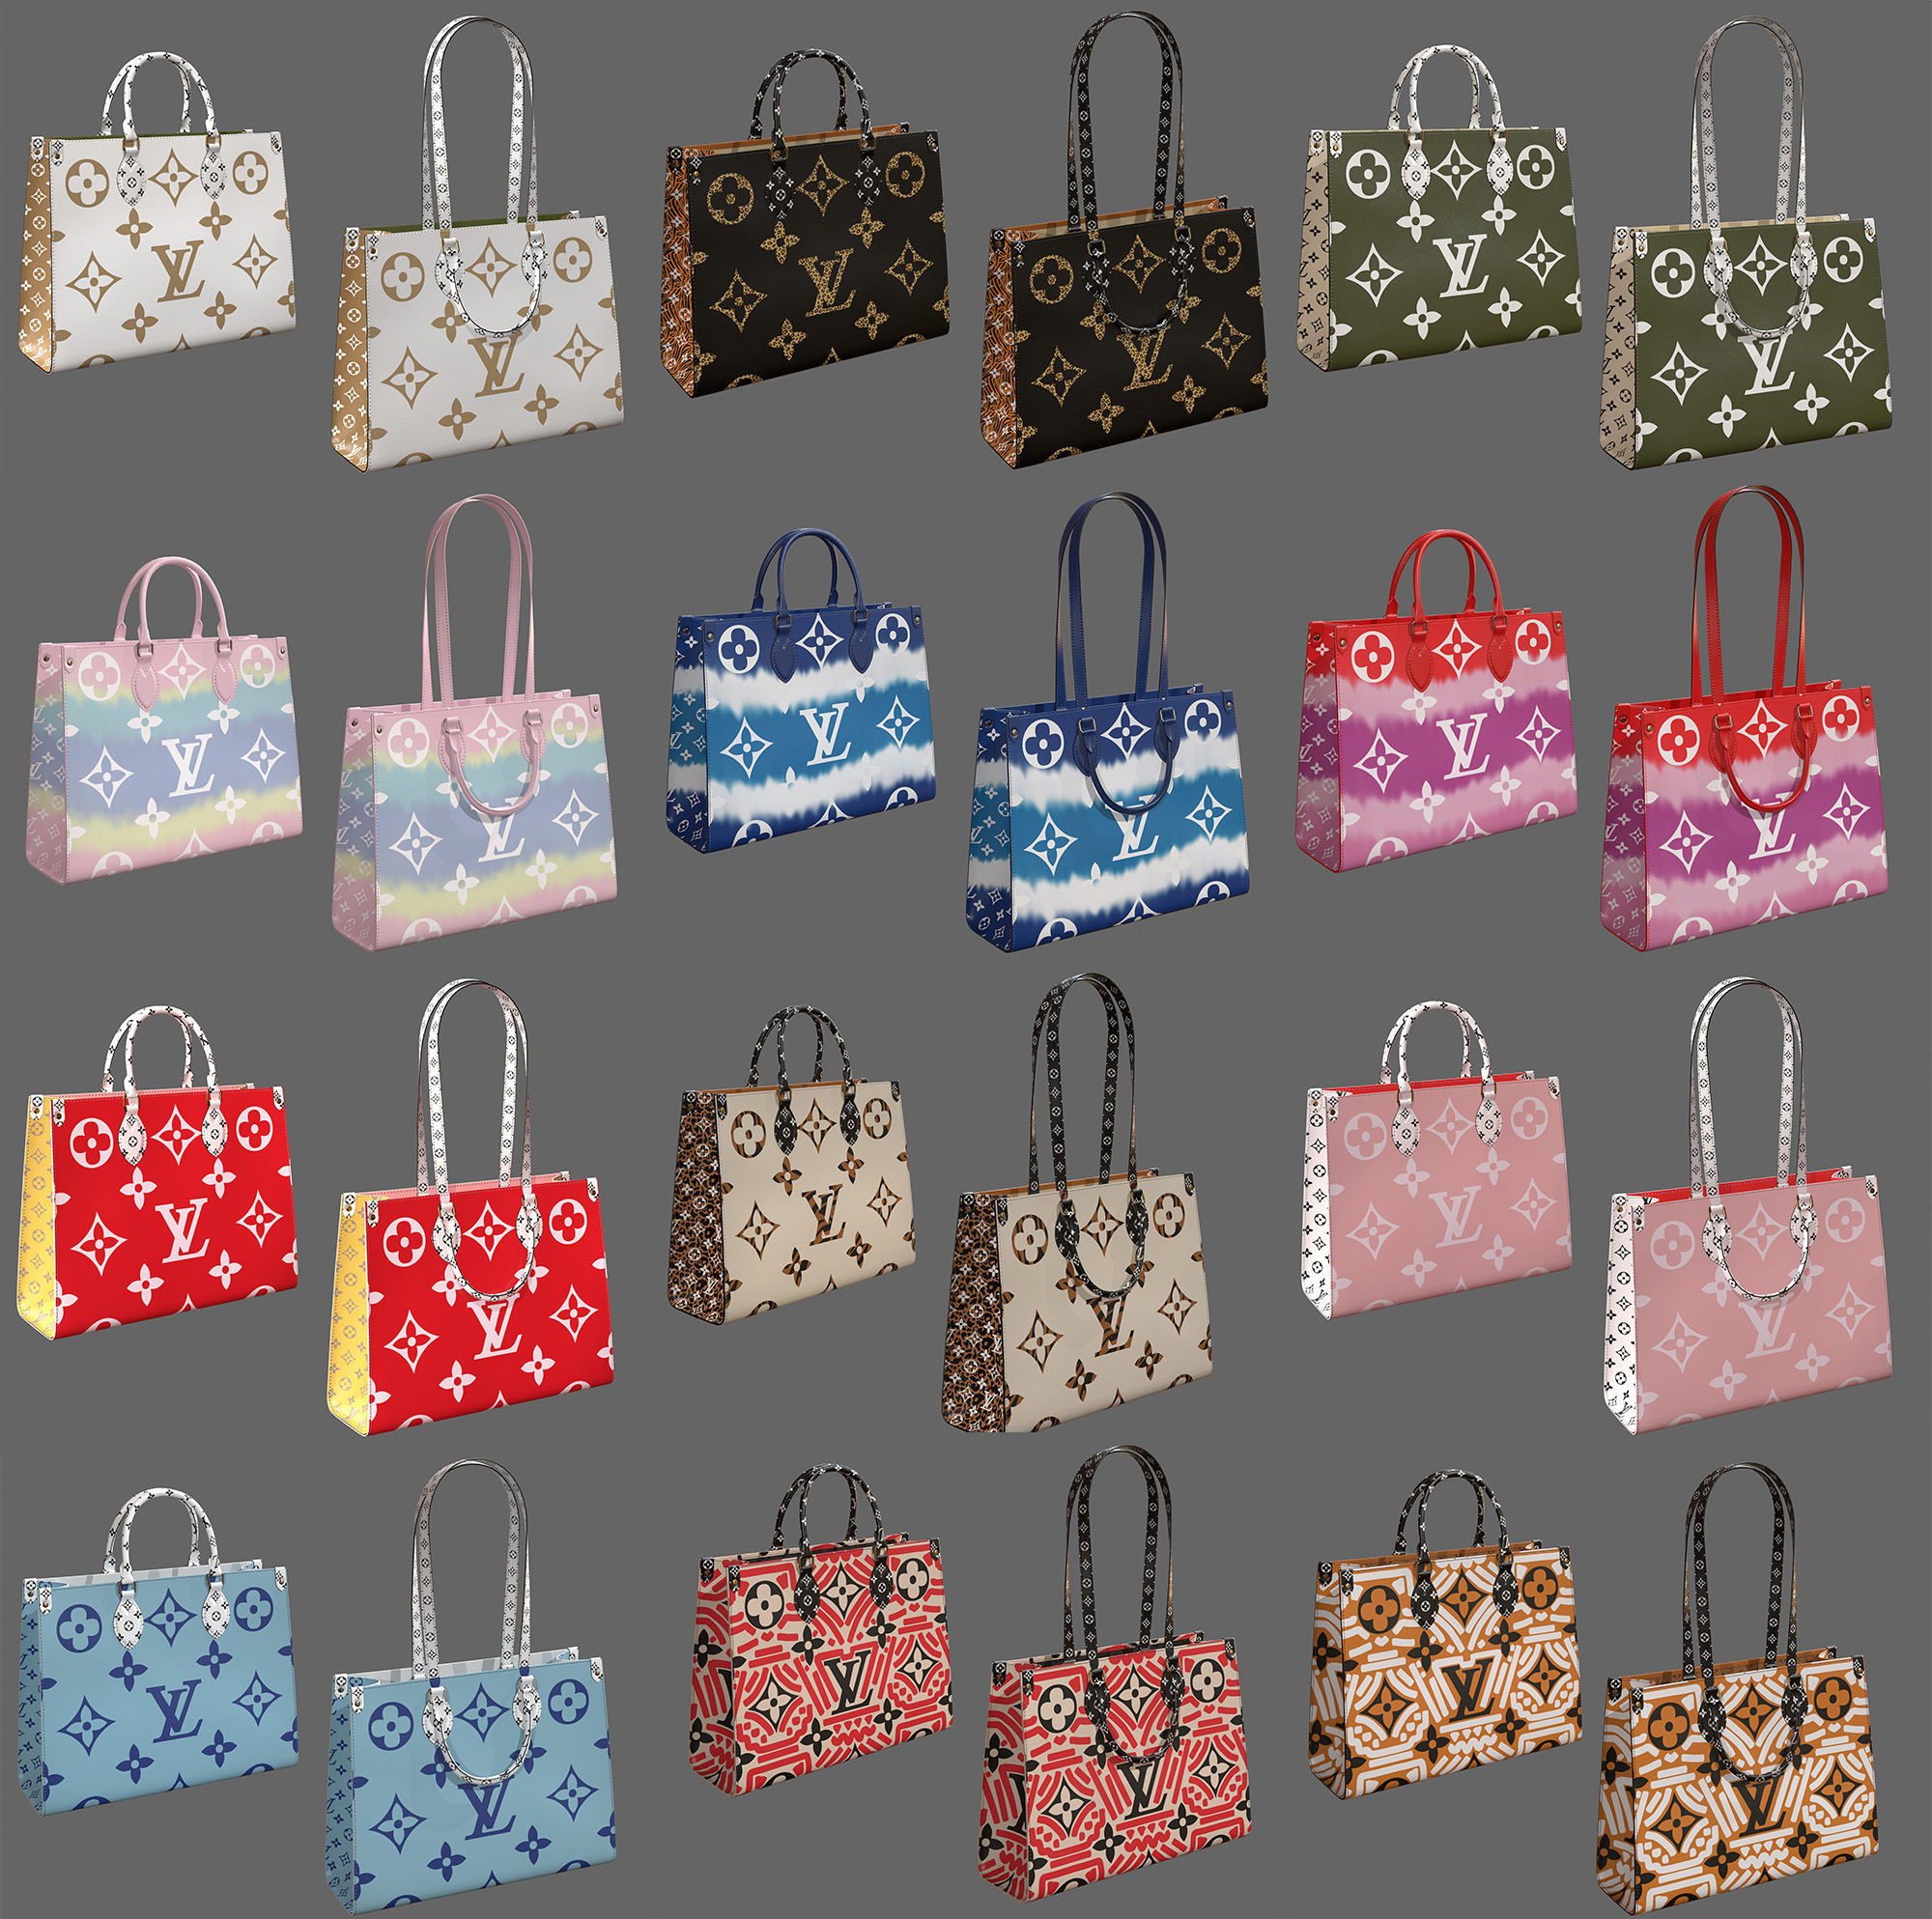 Louis Vuitton Onthego 12 Bags